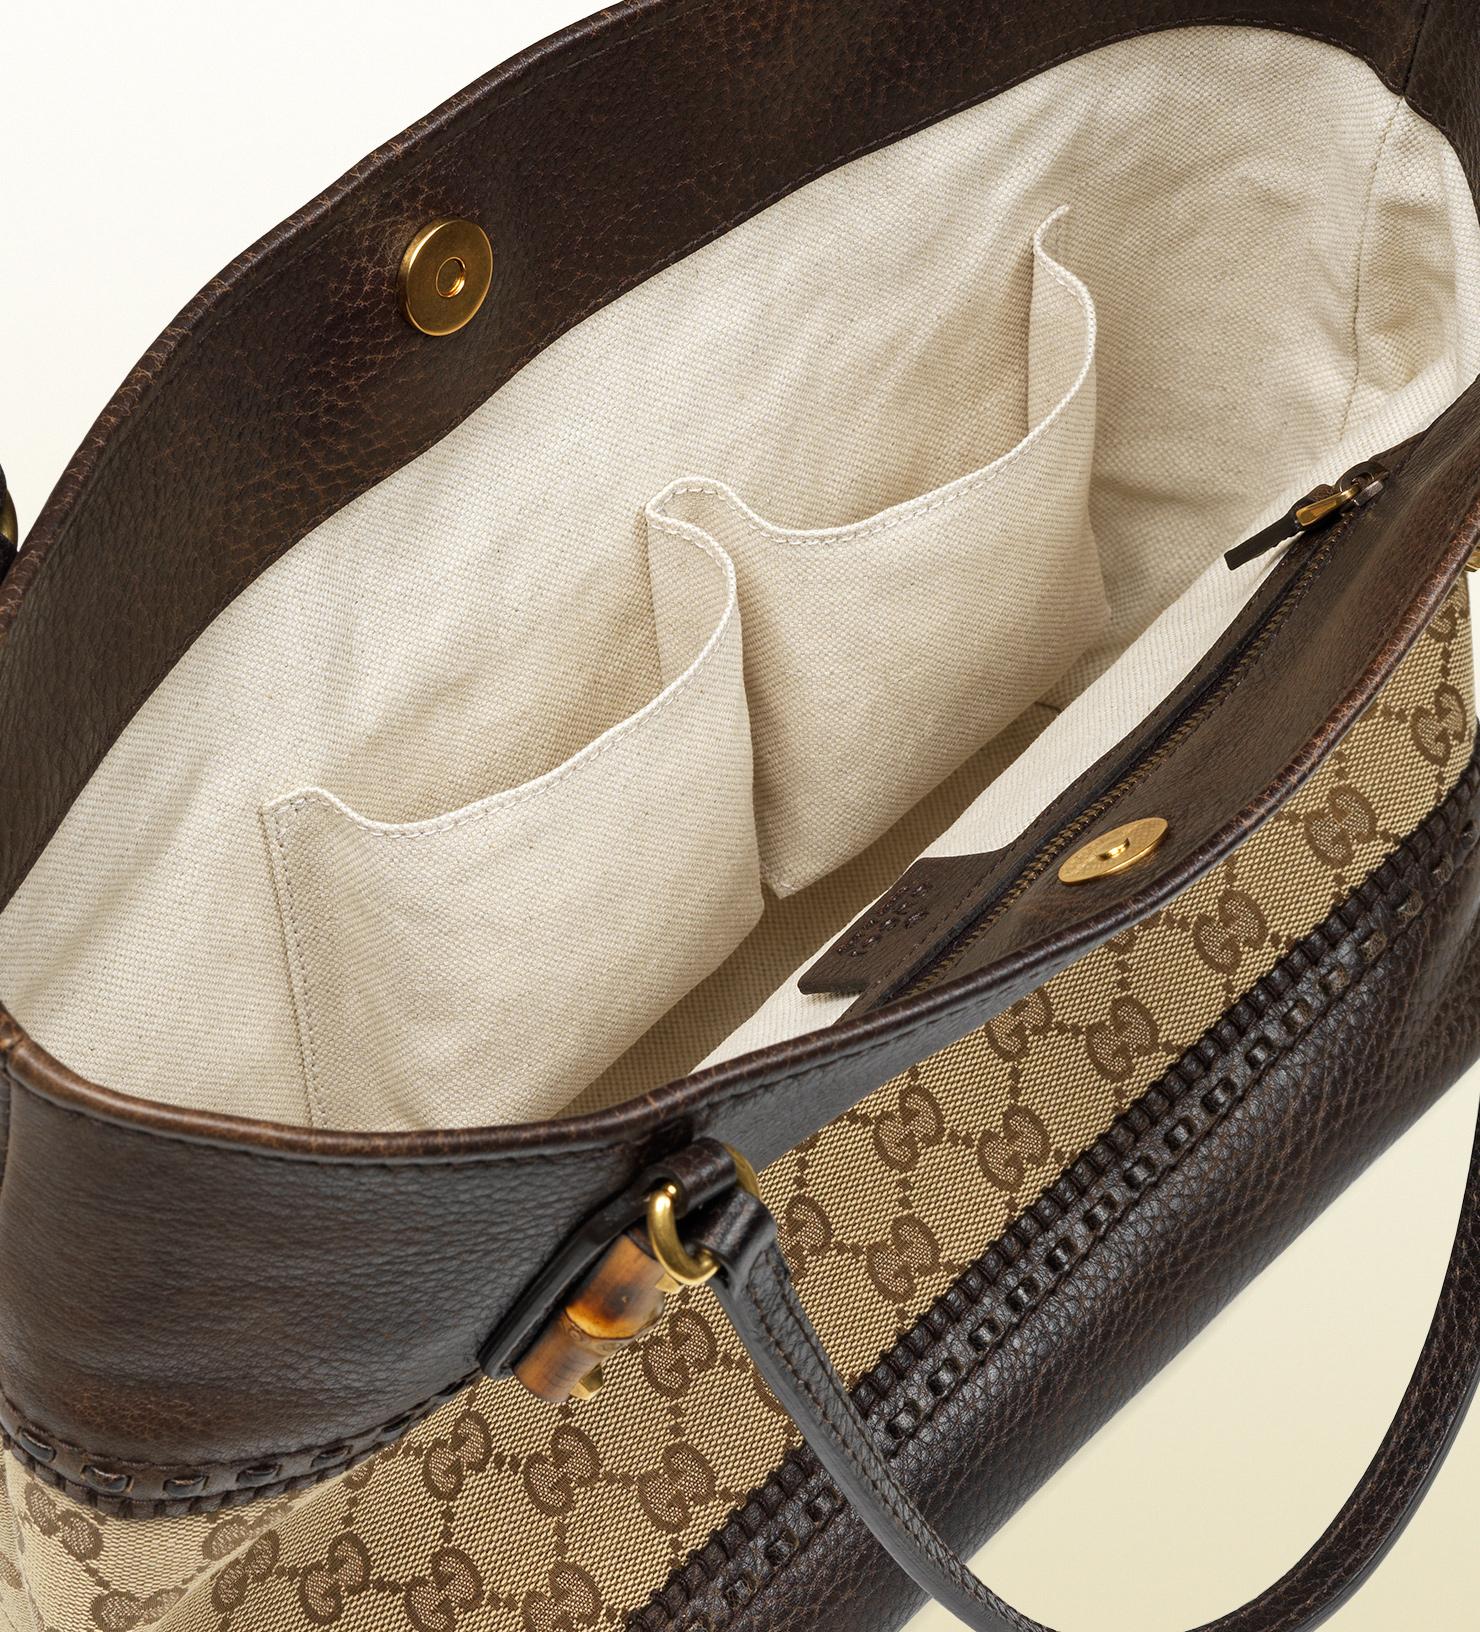 Gucci Laidback Crafty Original Gg Canvas Tote in Brown for Men - Lyst 3f25ab47e1b56